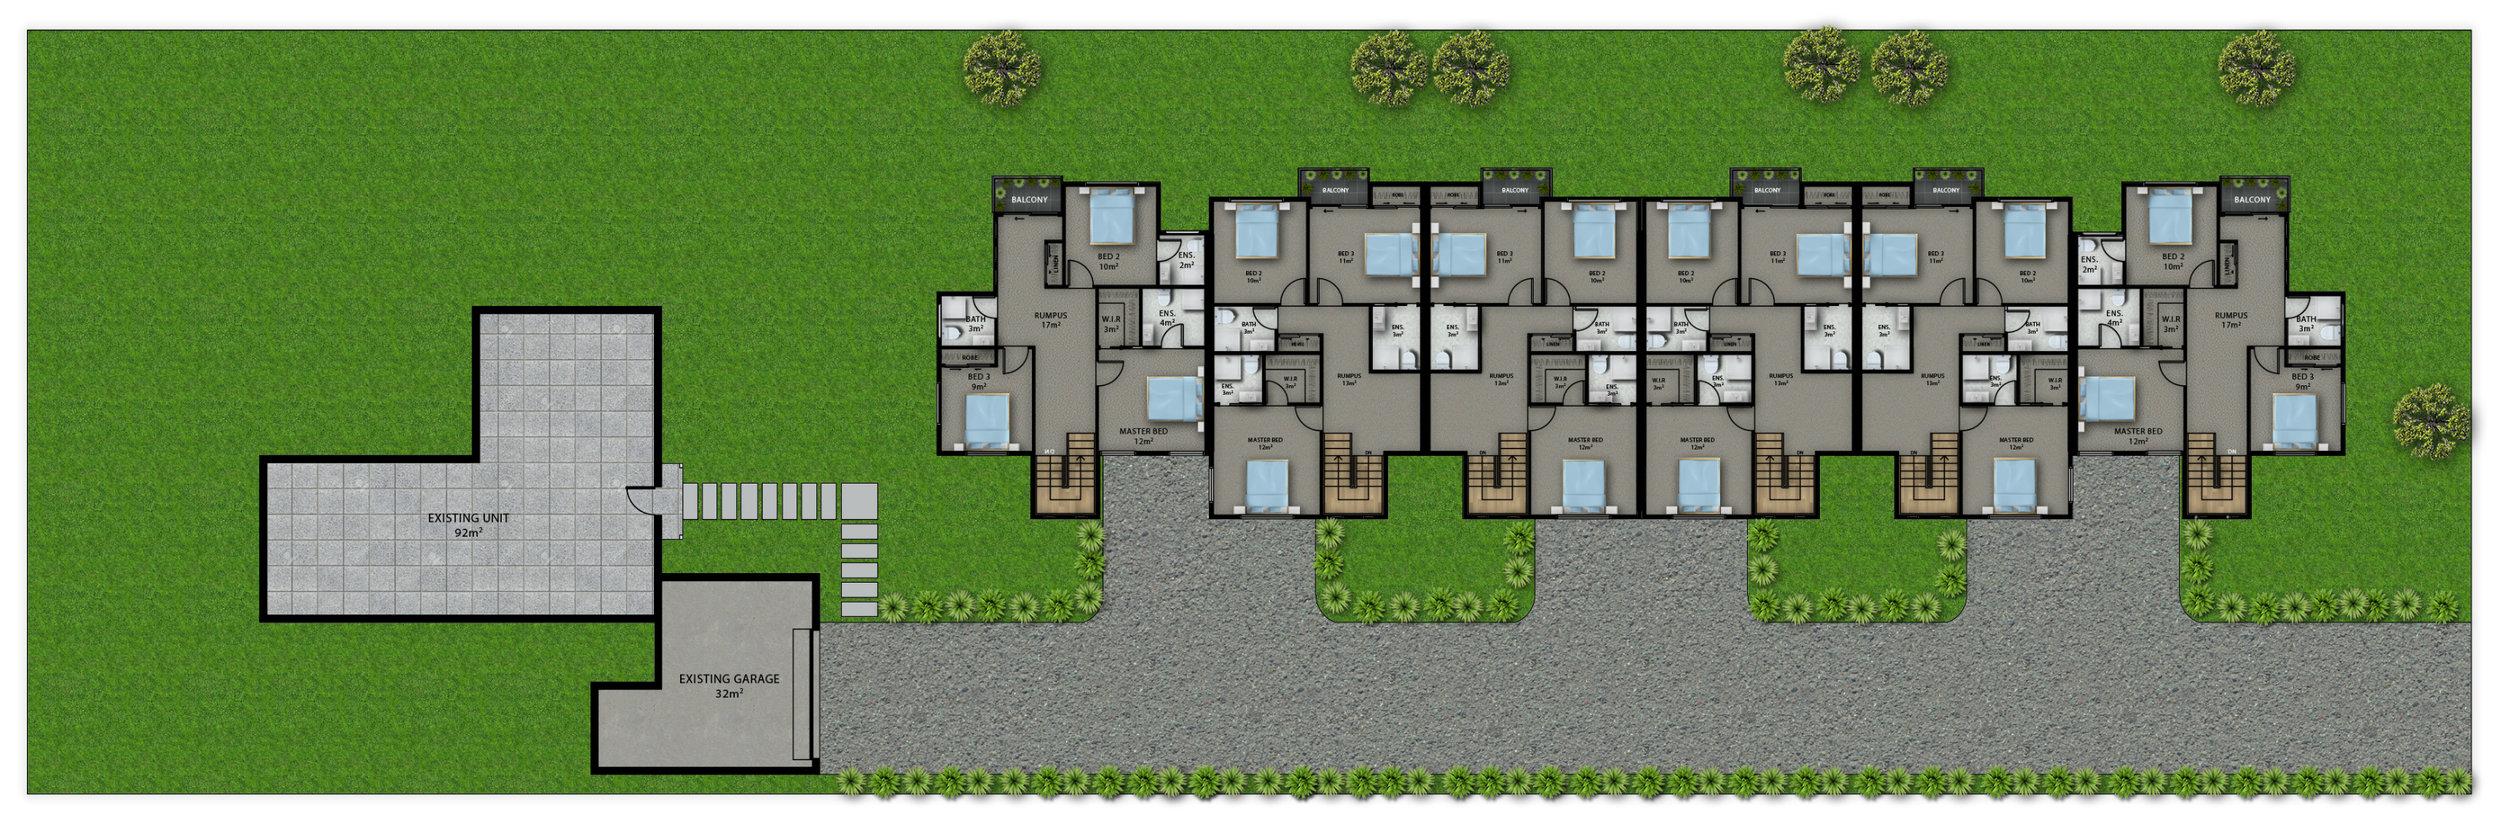 Simpson St - Site Plan - First Floor .jpg